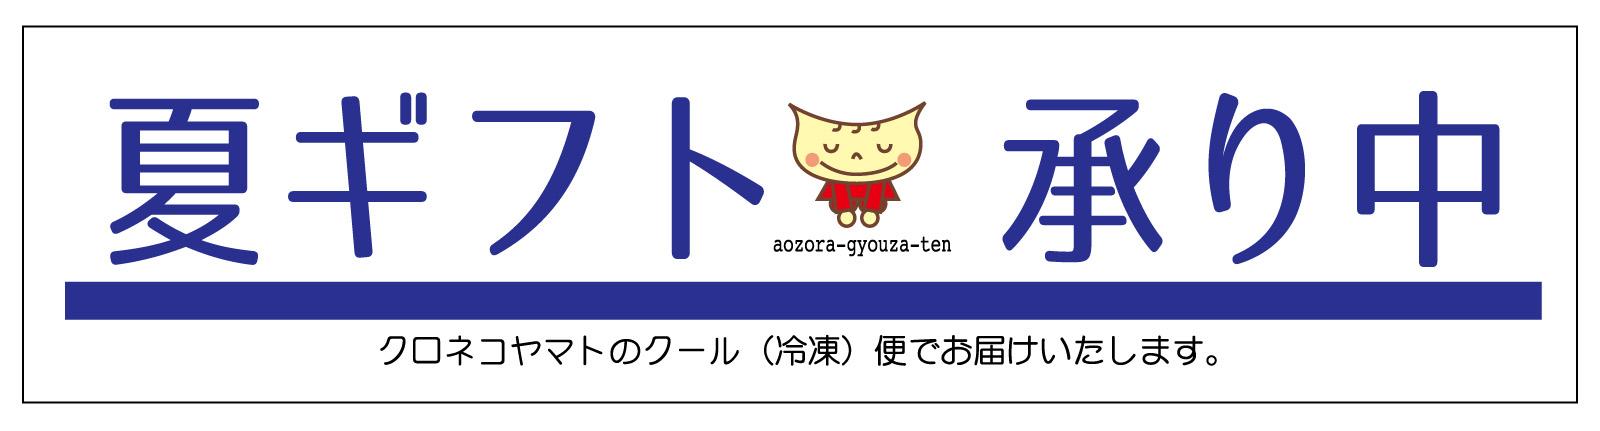 summer_gift